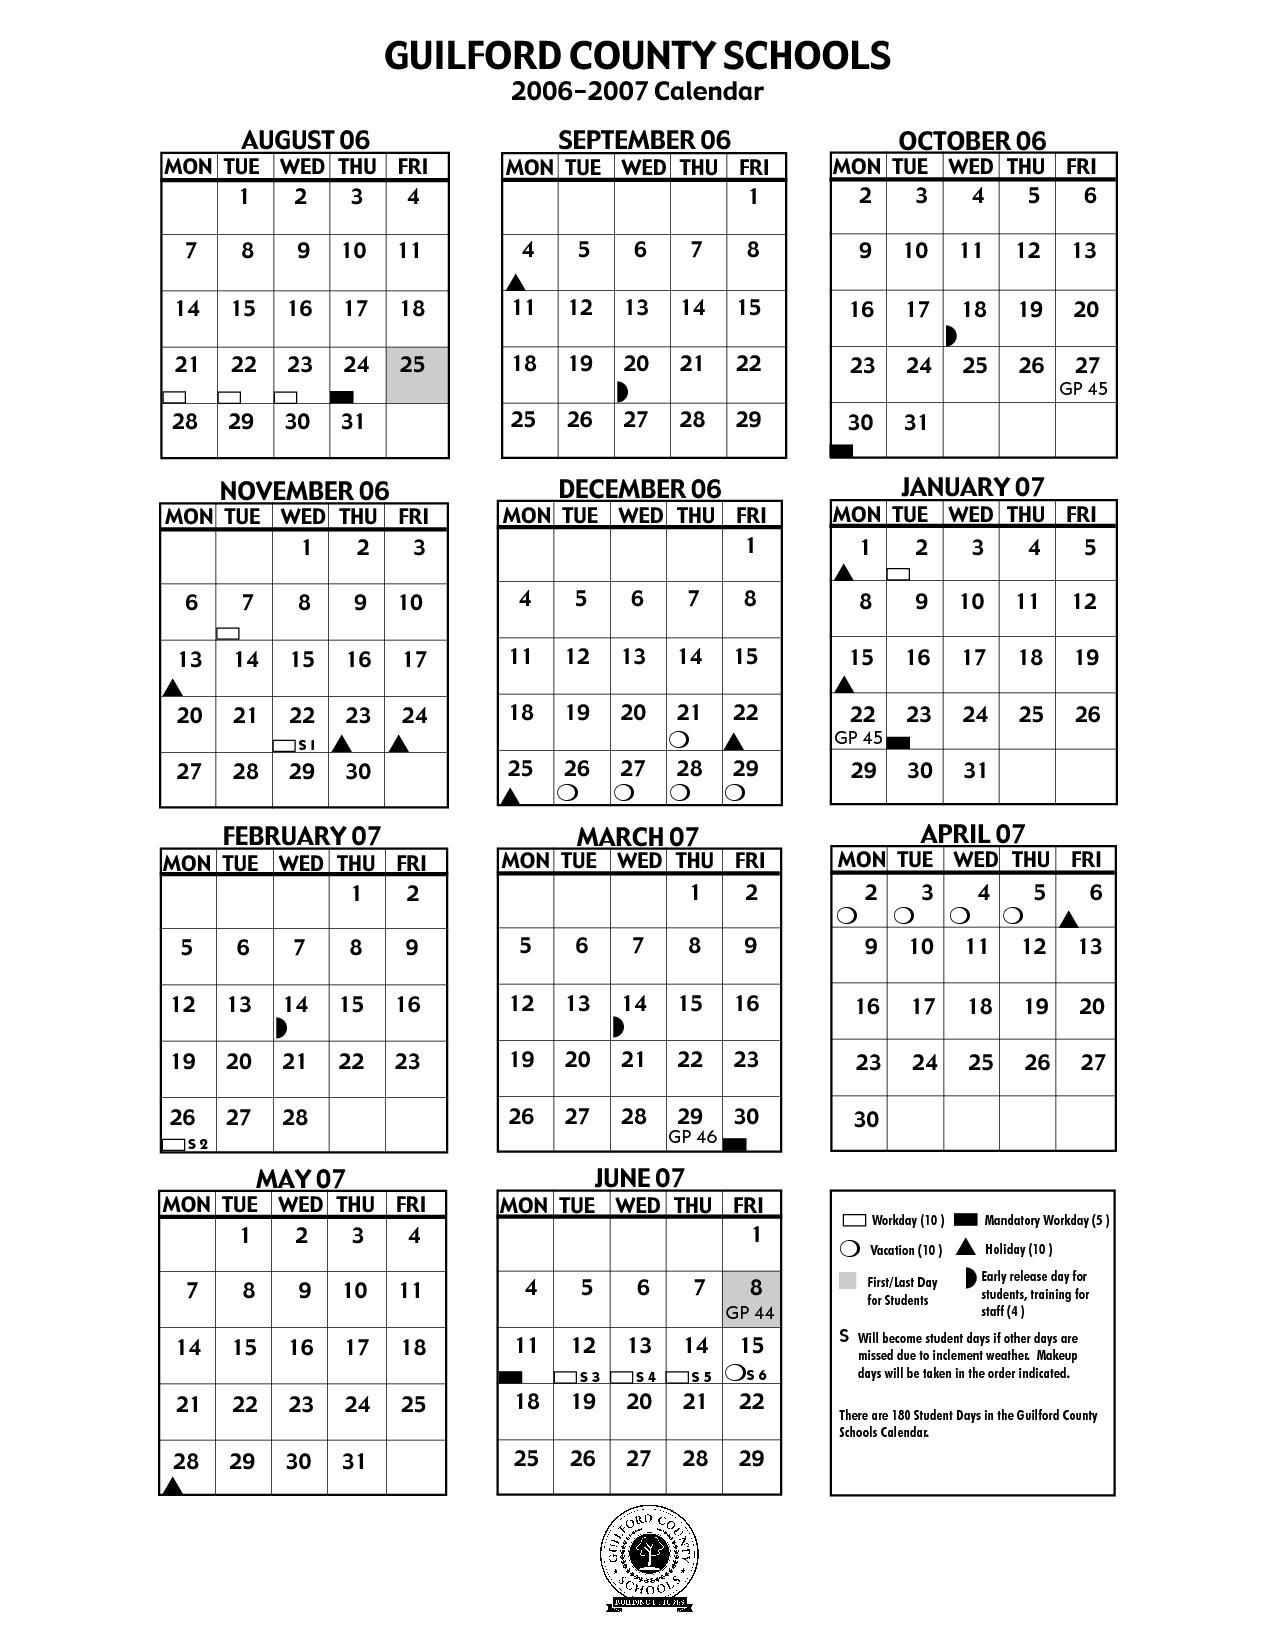 Guilford County Schools Calendar